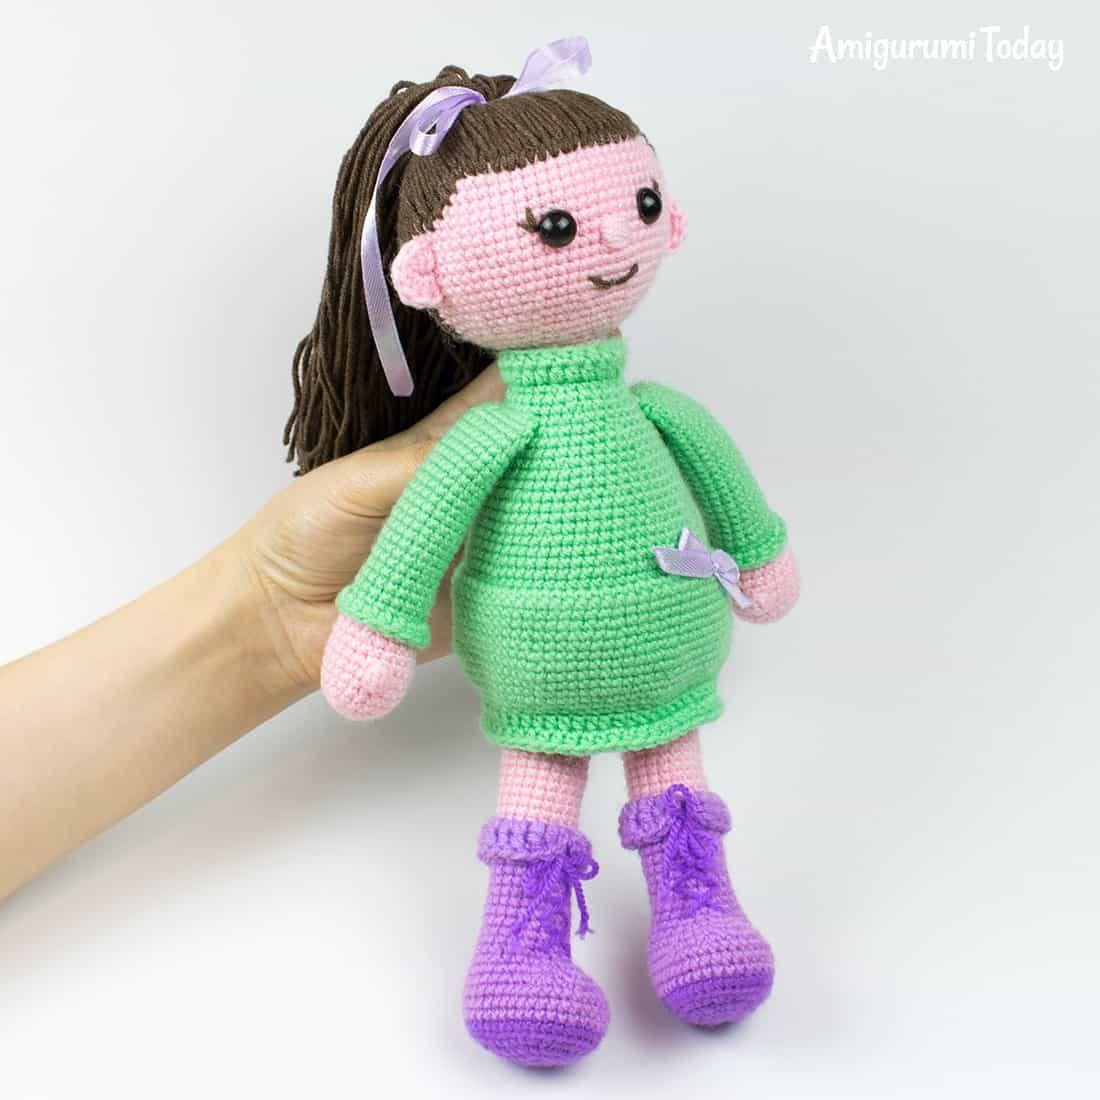 Boneca De Croche Lu + Boneca Lulu + Urso Amigurumi - R$ 350,00 em ...   1100x1100